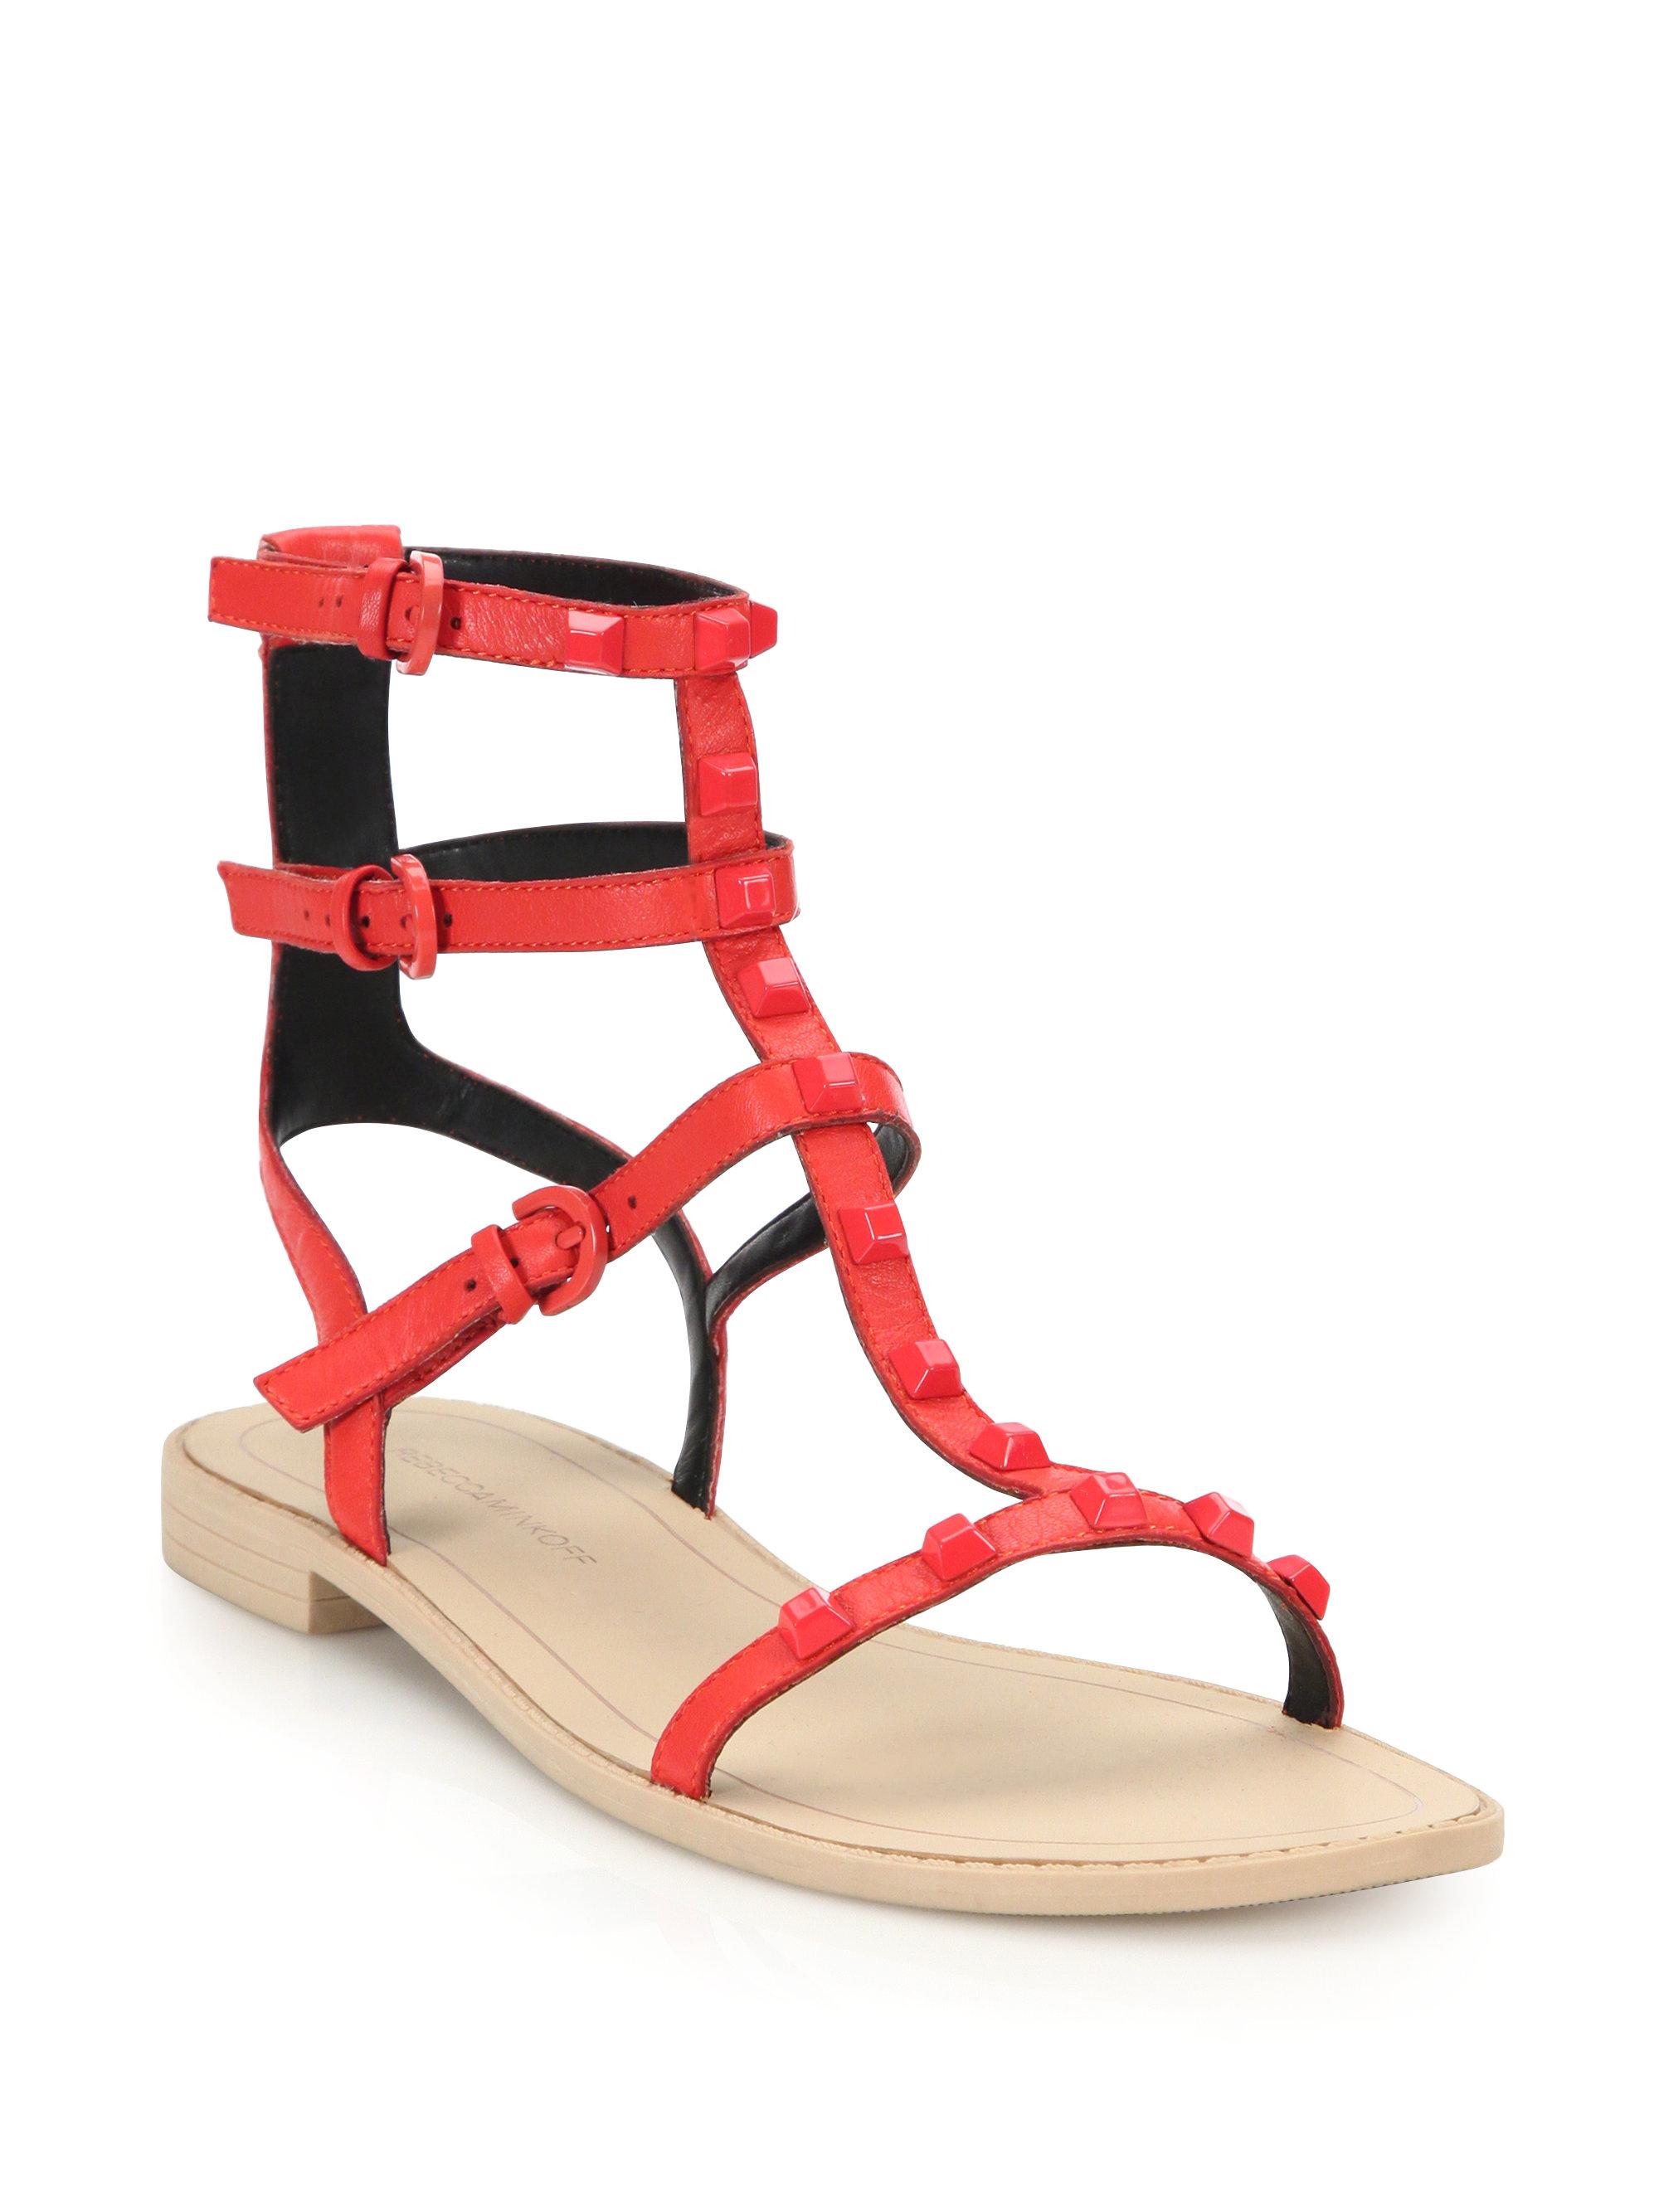 56303213213 Lyst - Rebecca Minkoff Georgina Studded Leather Gladiator Sandals in Red